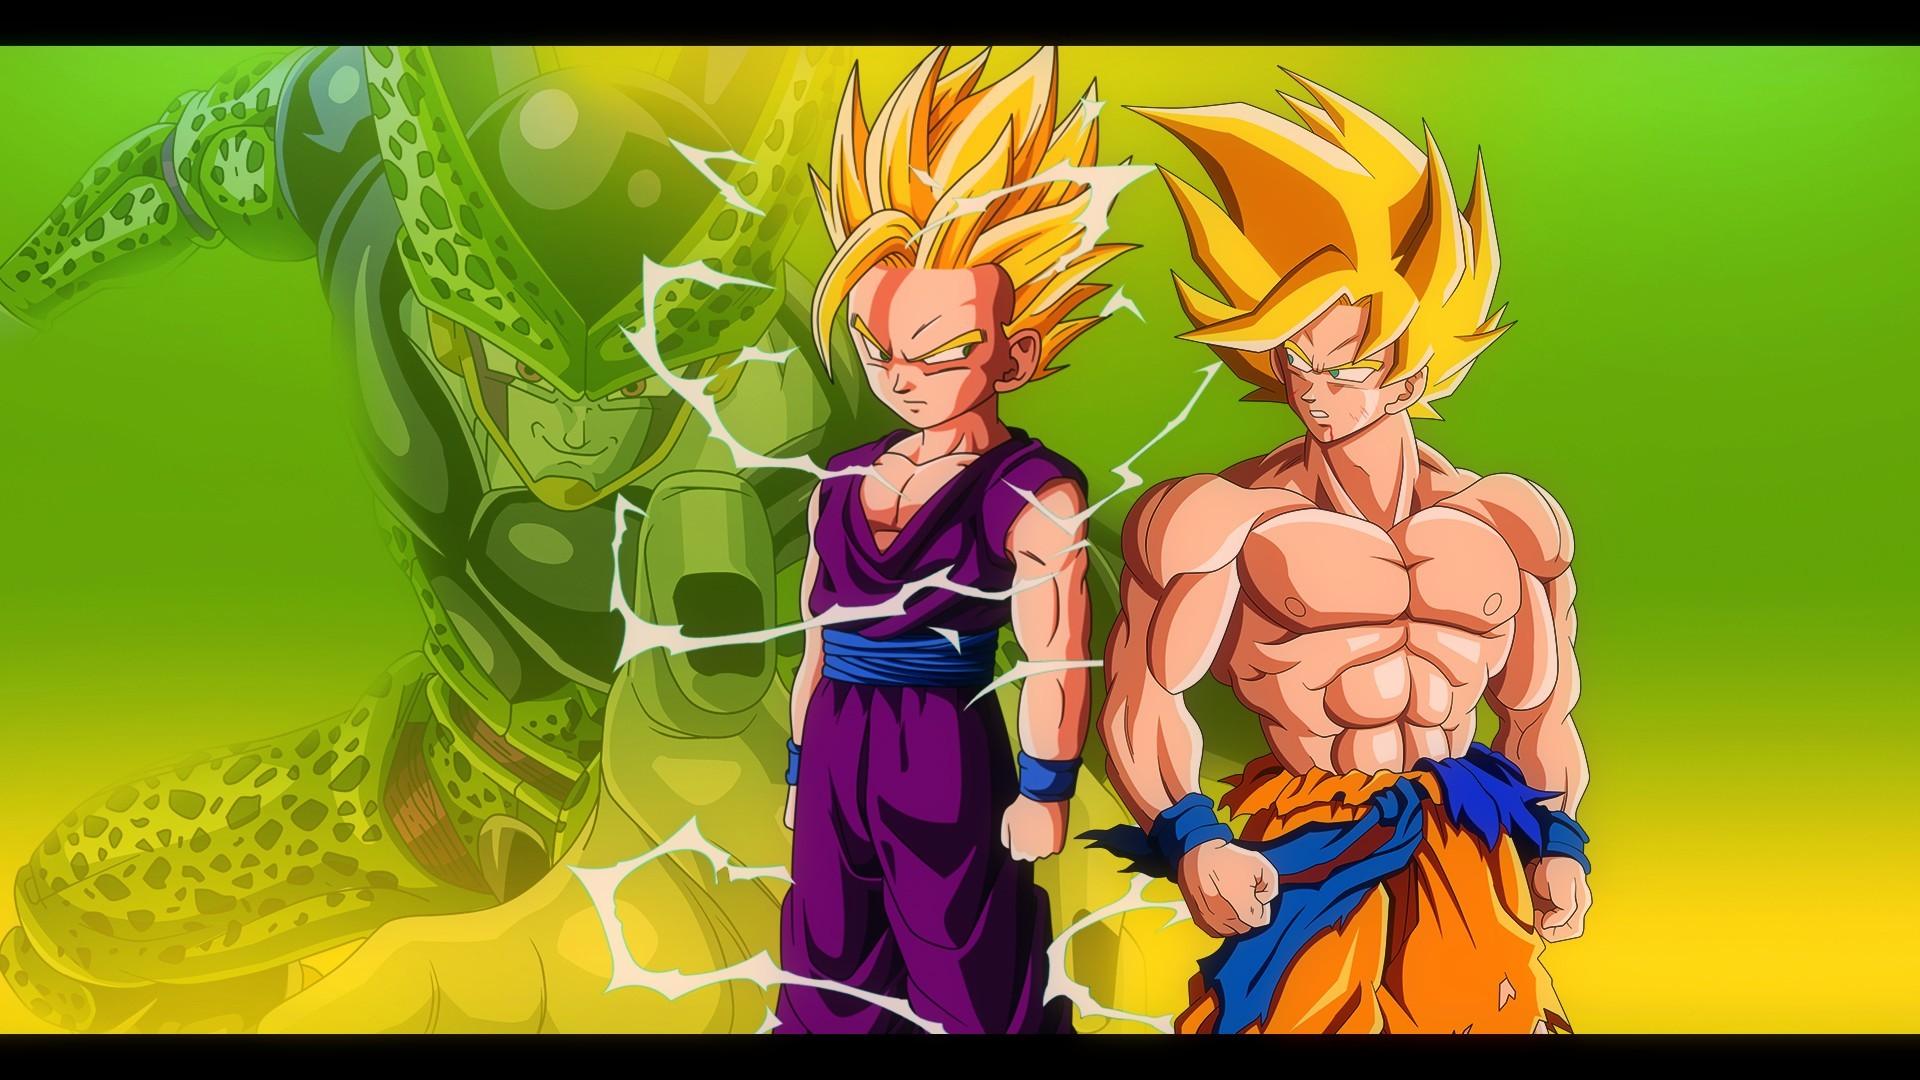 Dragon ball z budokai 3: super saiyan 2 gohan vs. Perfect cell.